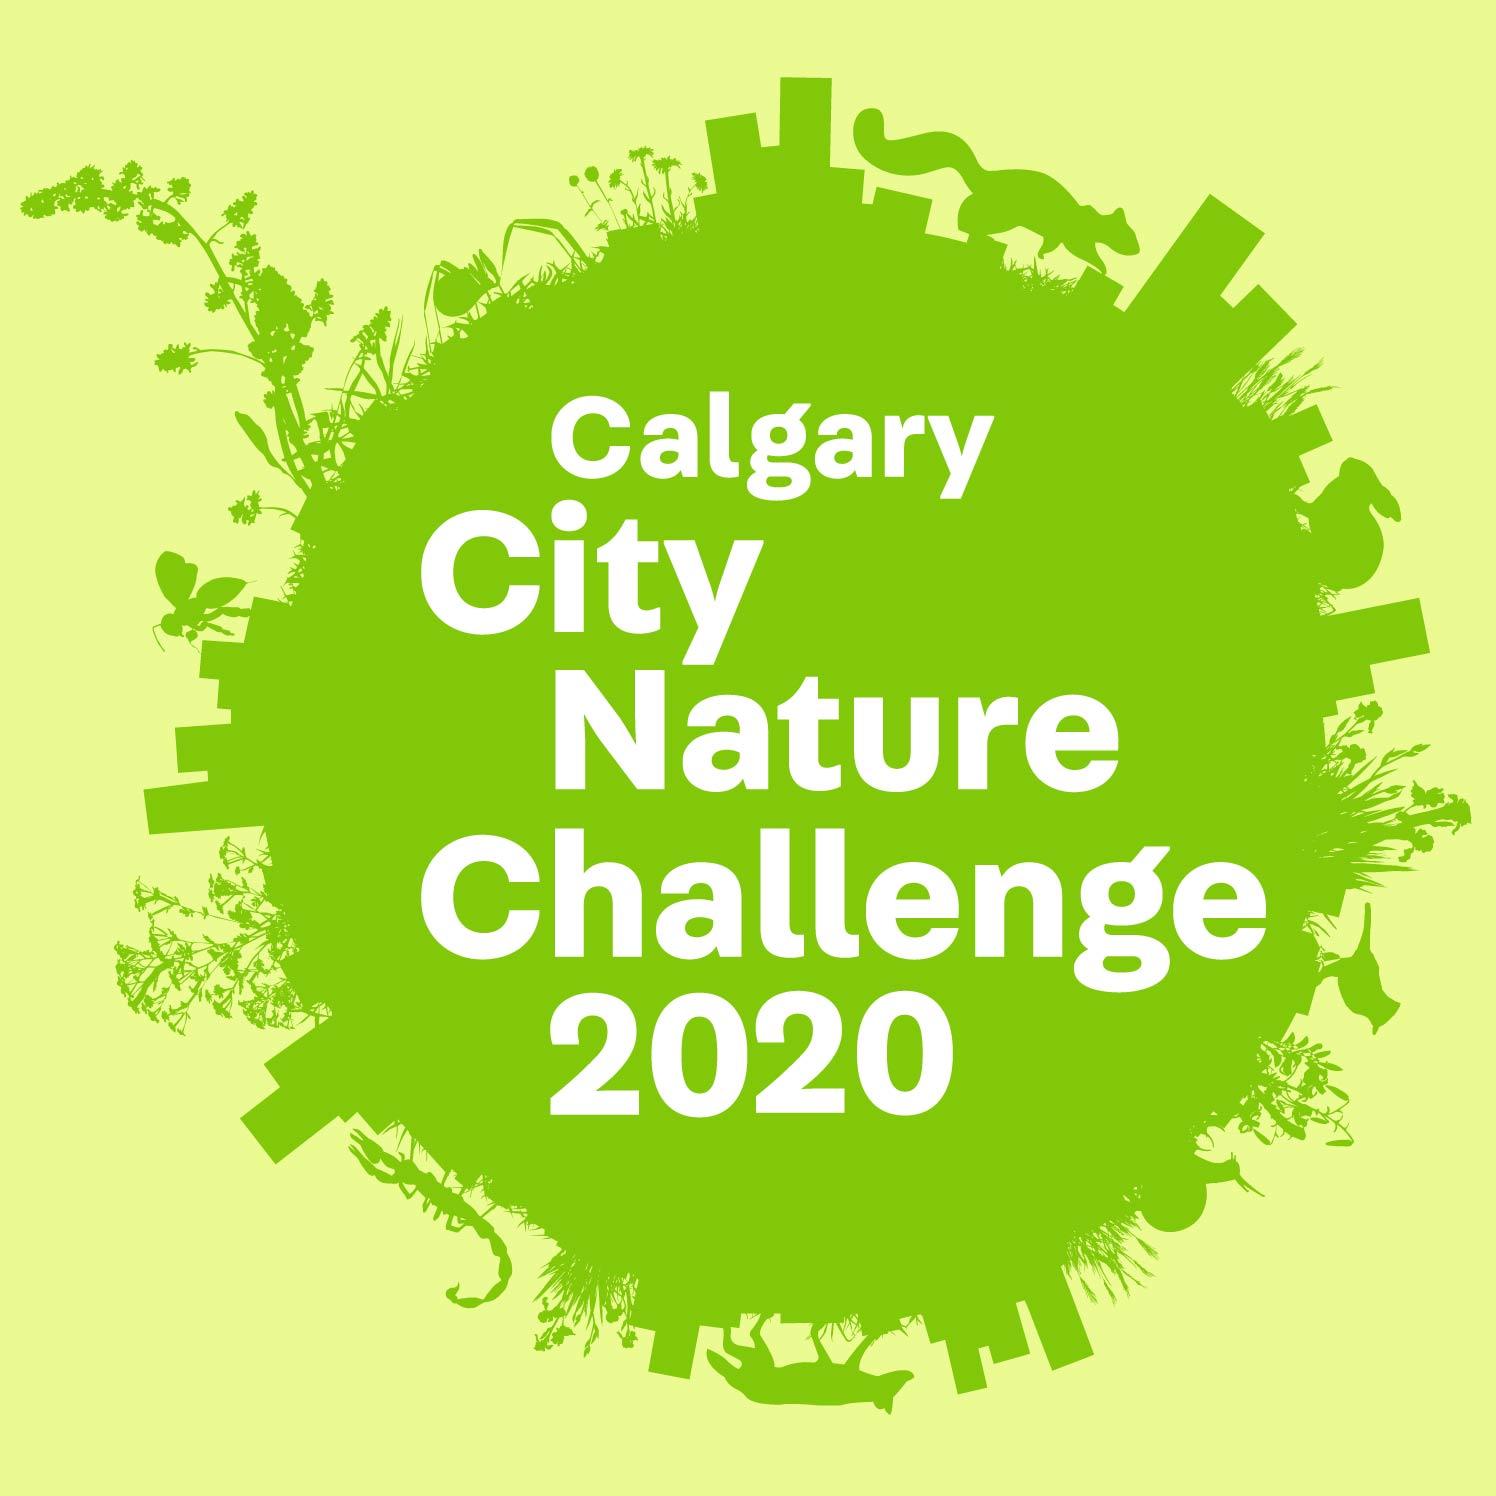 www.citynatureyyc.ca